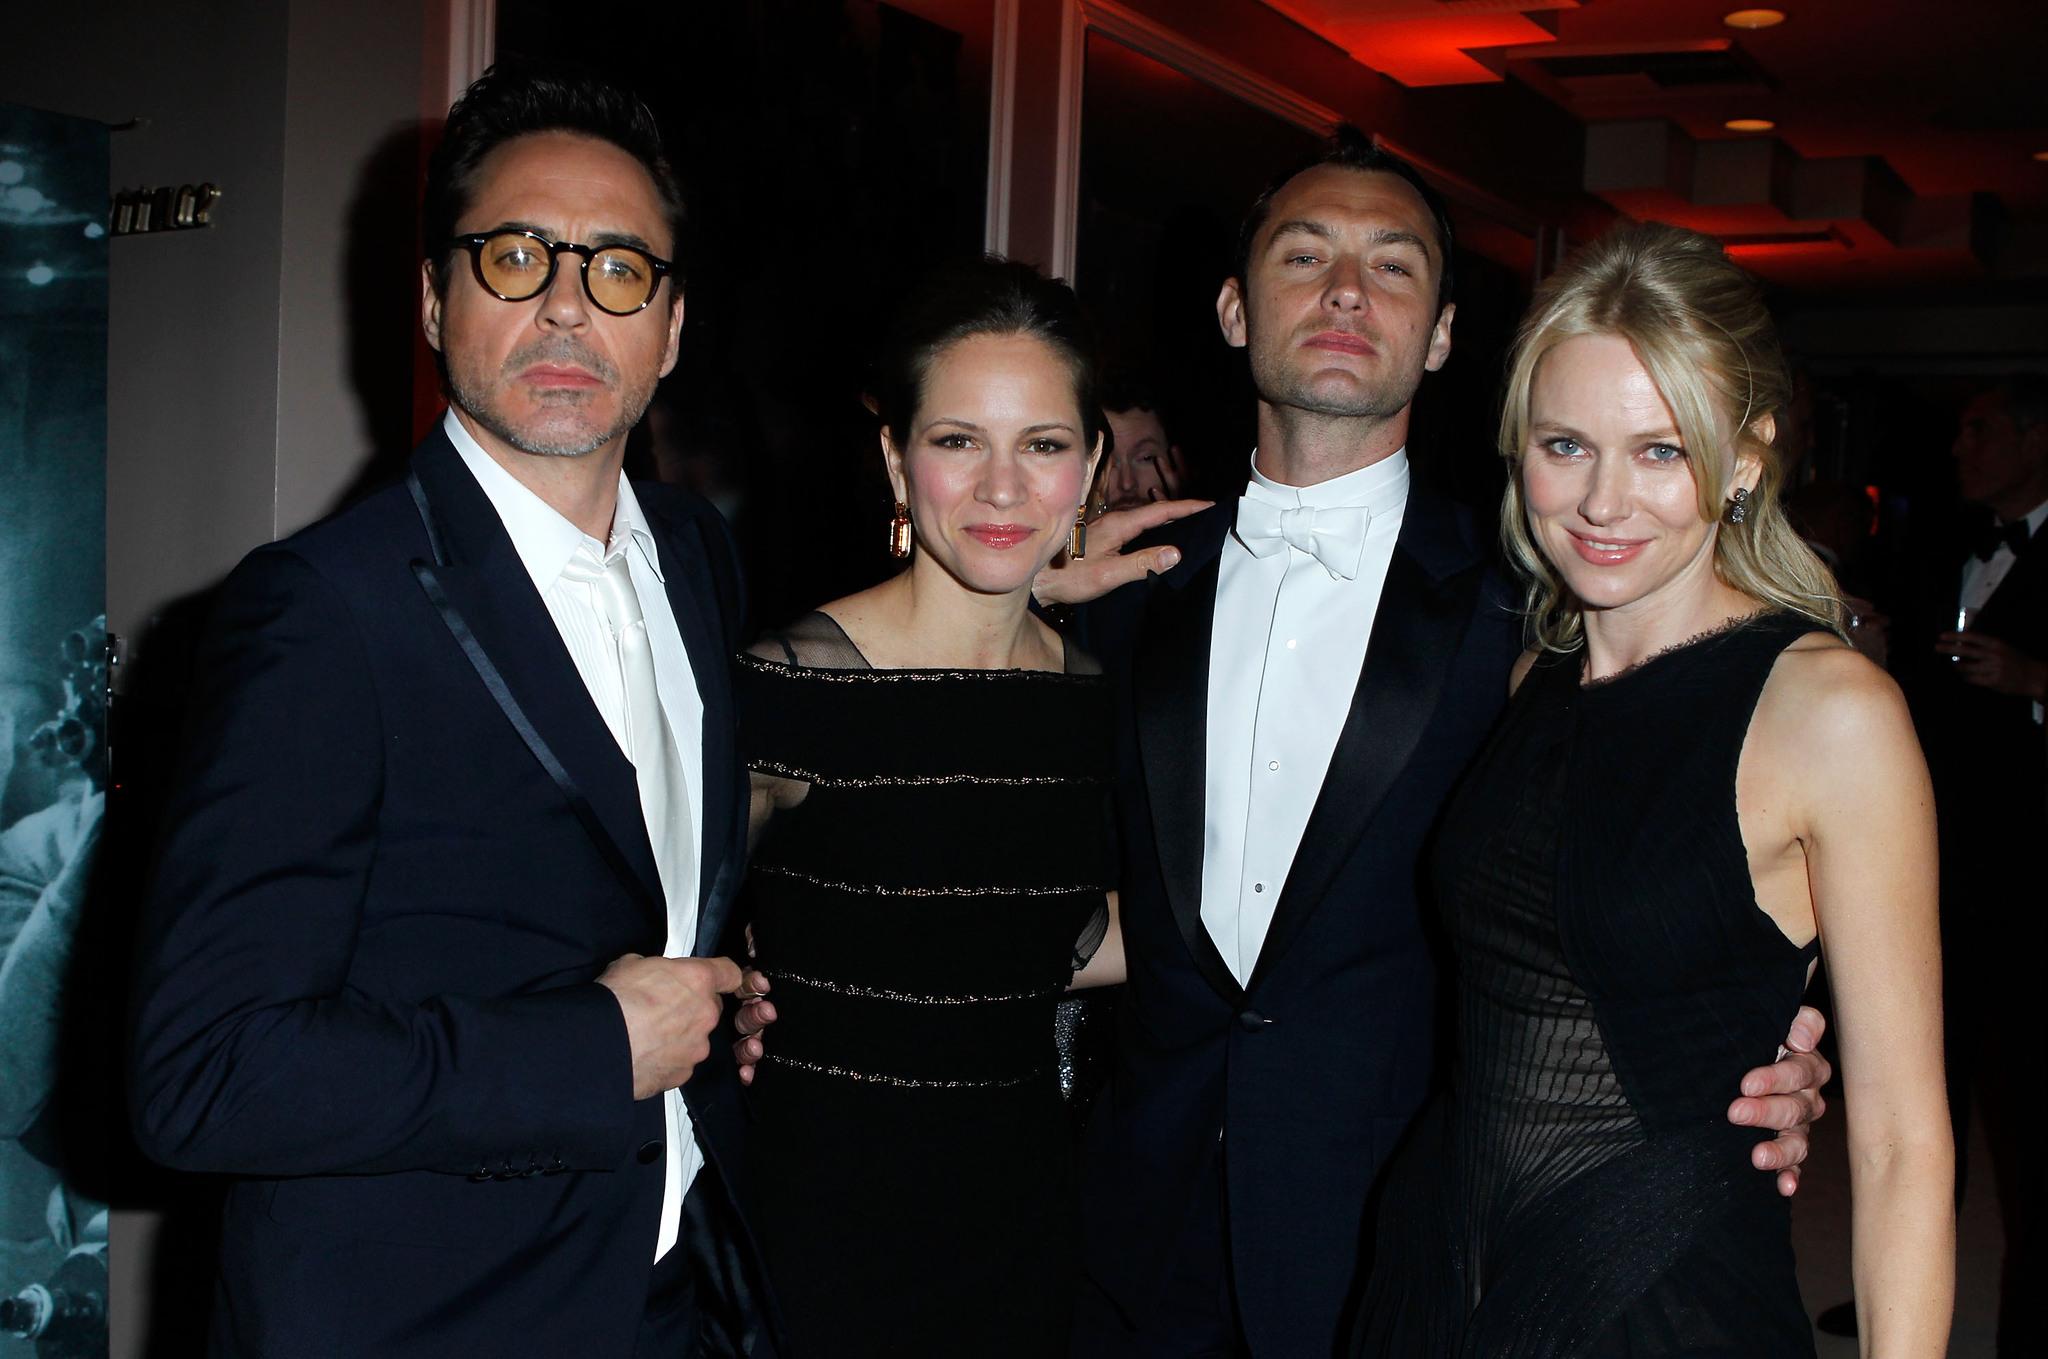 Jude Law, Robert Downey Jr., Naomi Watts and Susan Downey